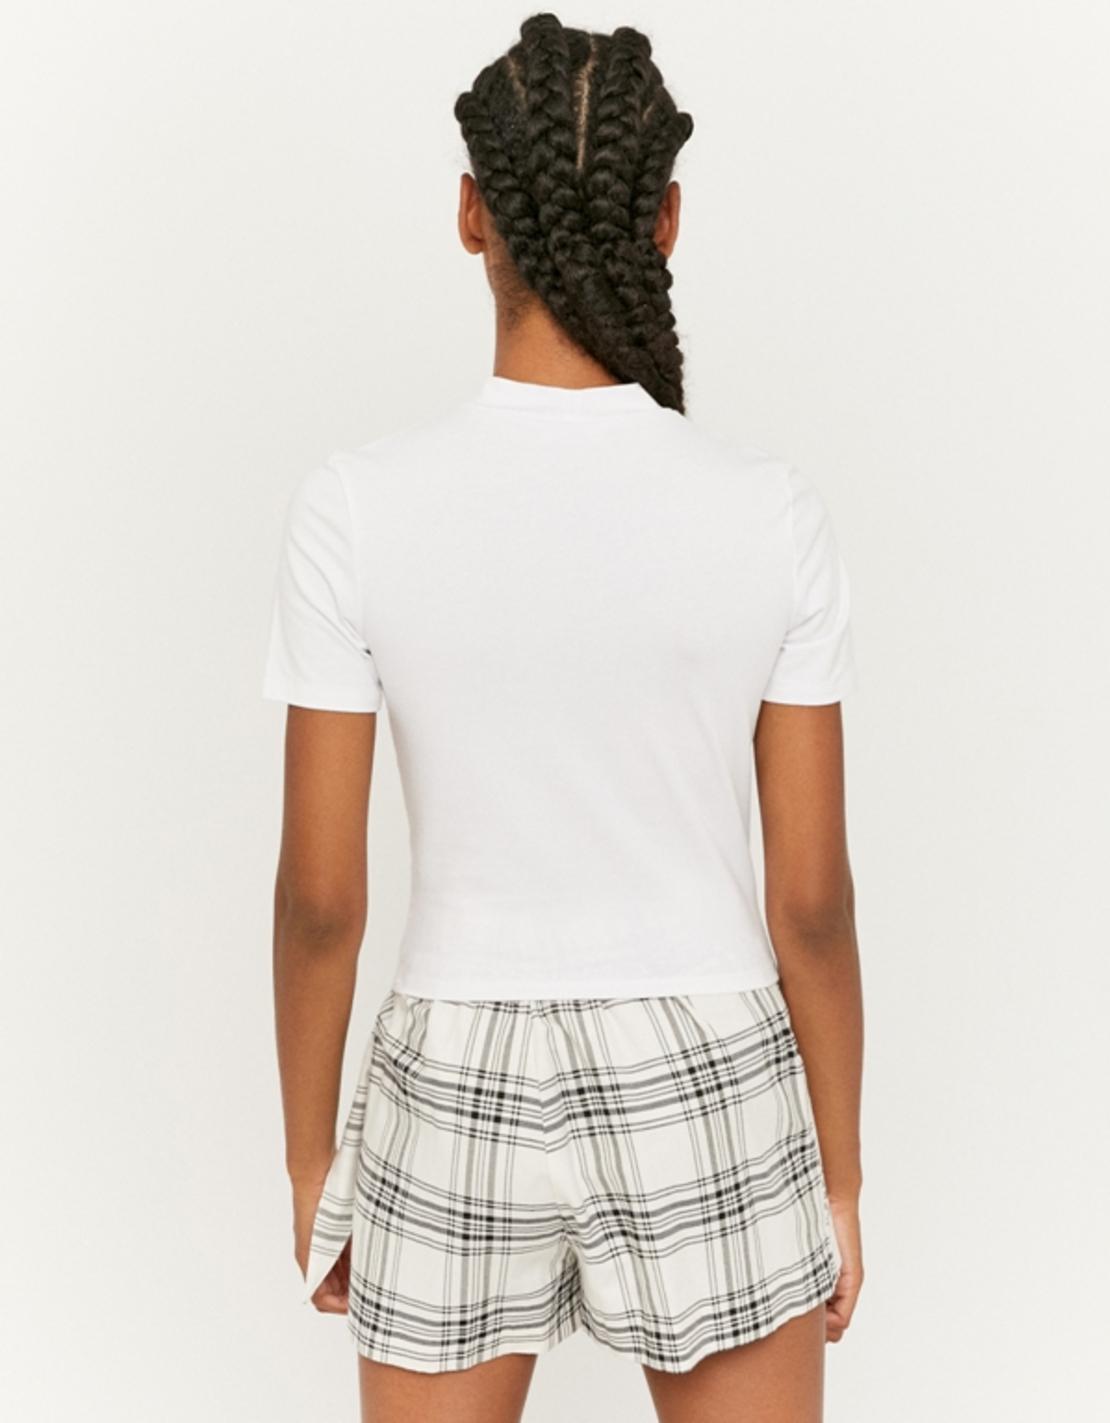 חצאית  מכנס SSHPEGUKO